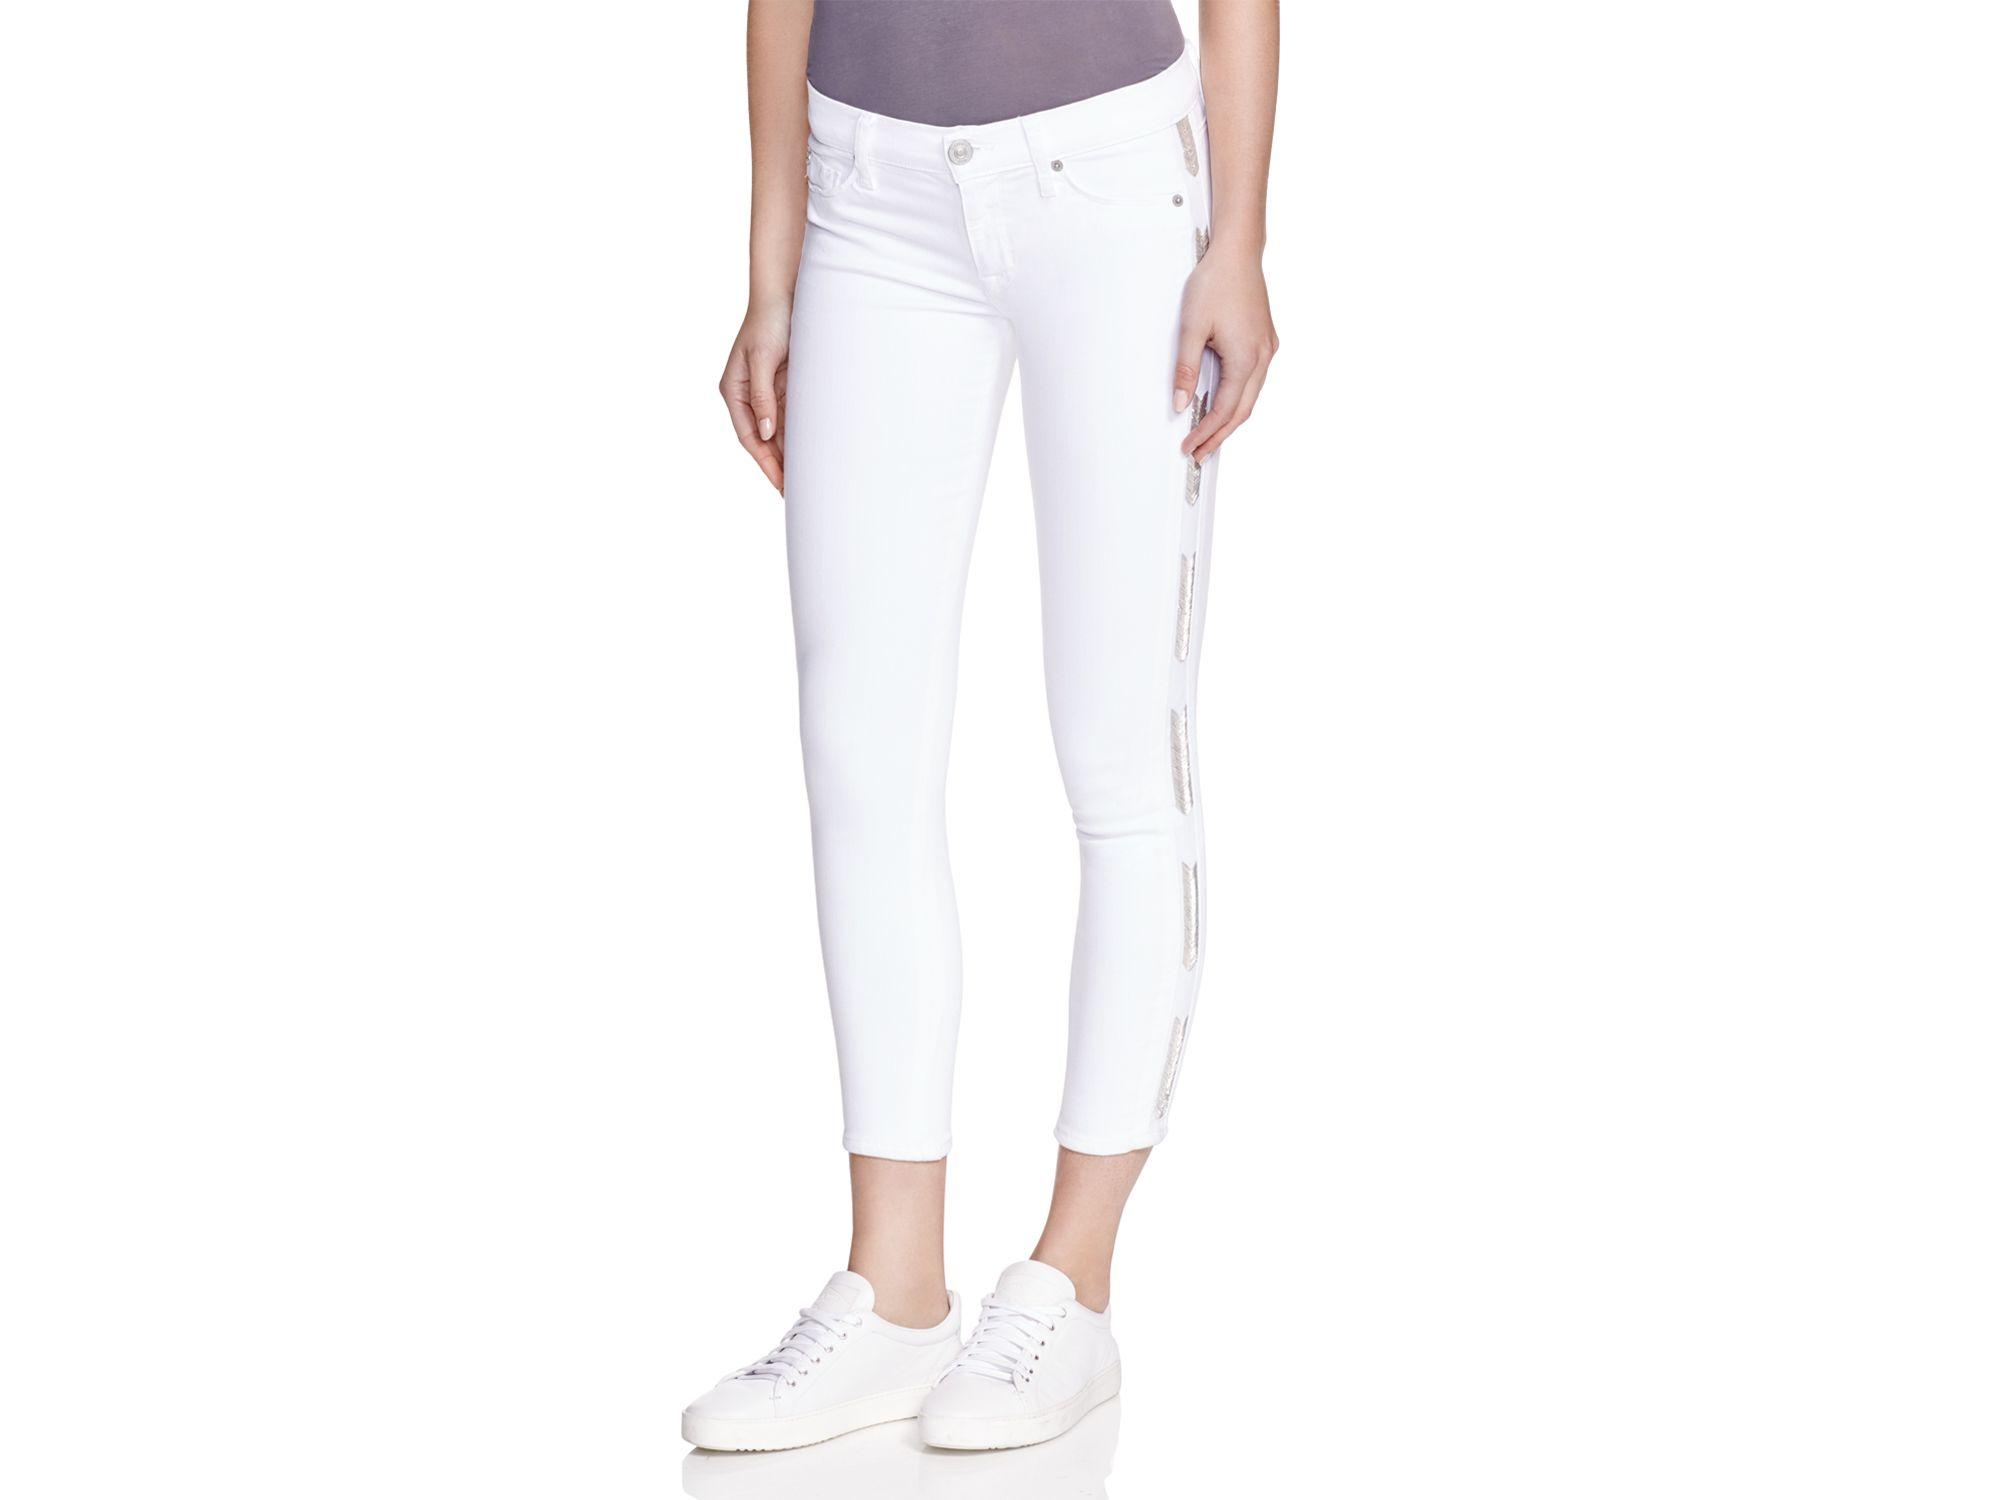 Hudson jeans Luna Super Skinny Crop Jeans In White in White | Lyst